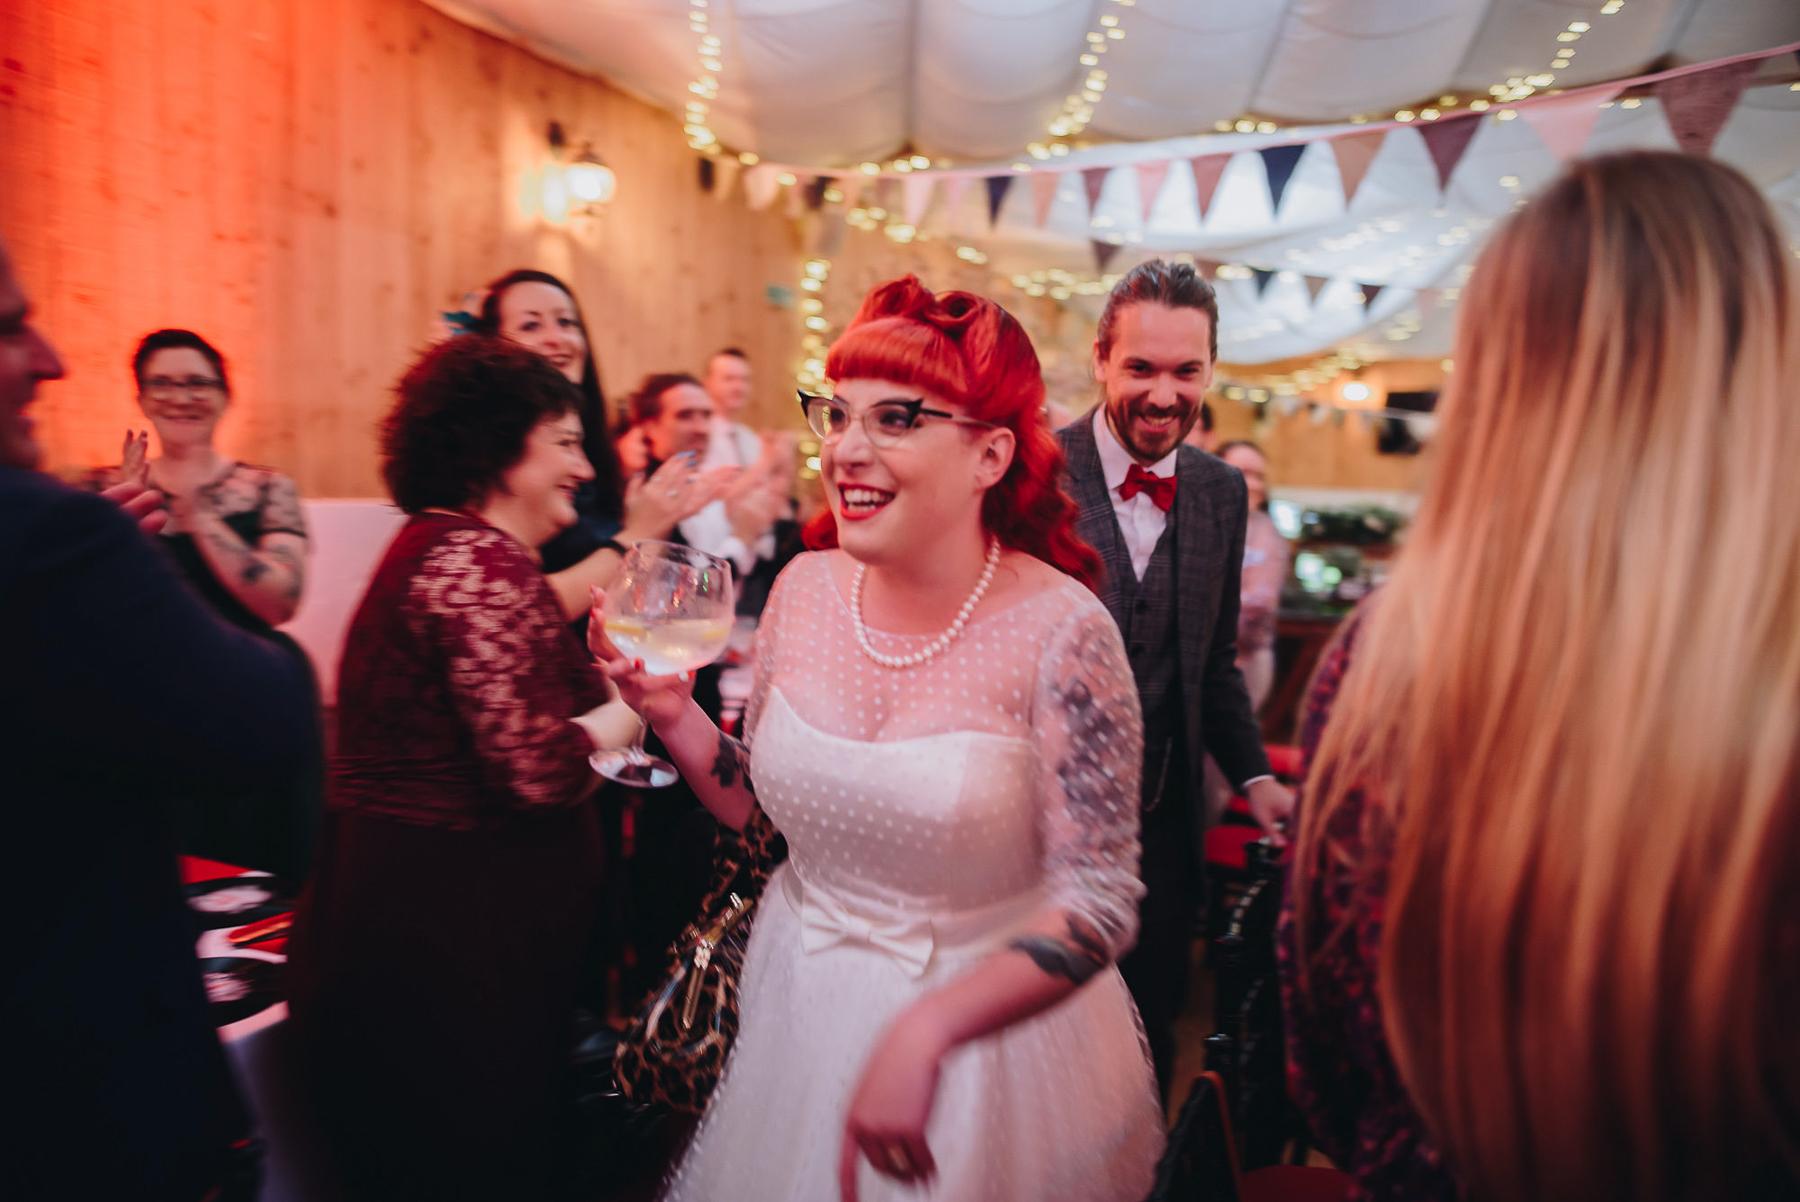 Wellbeing_Farm_Wedding_Photography_The_Pin-Up_Bride_Lara_Shaun-120.jpg